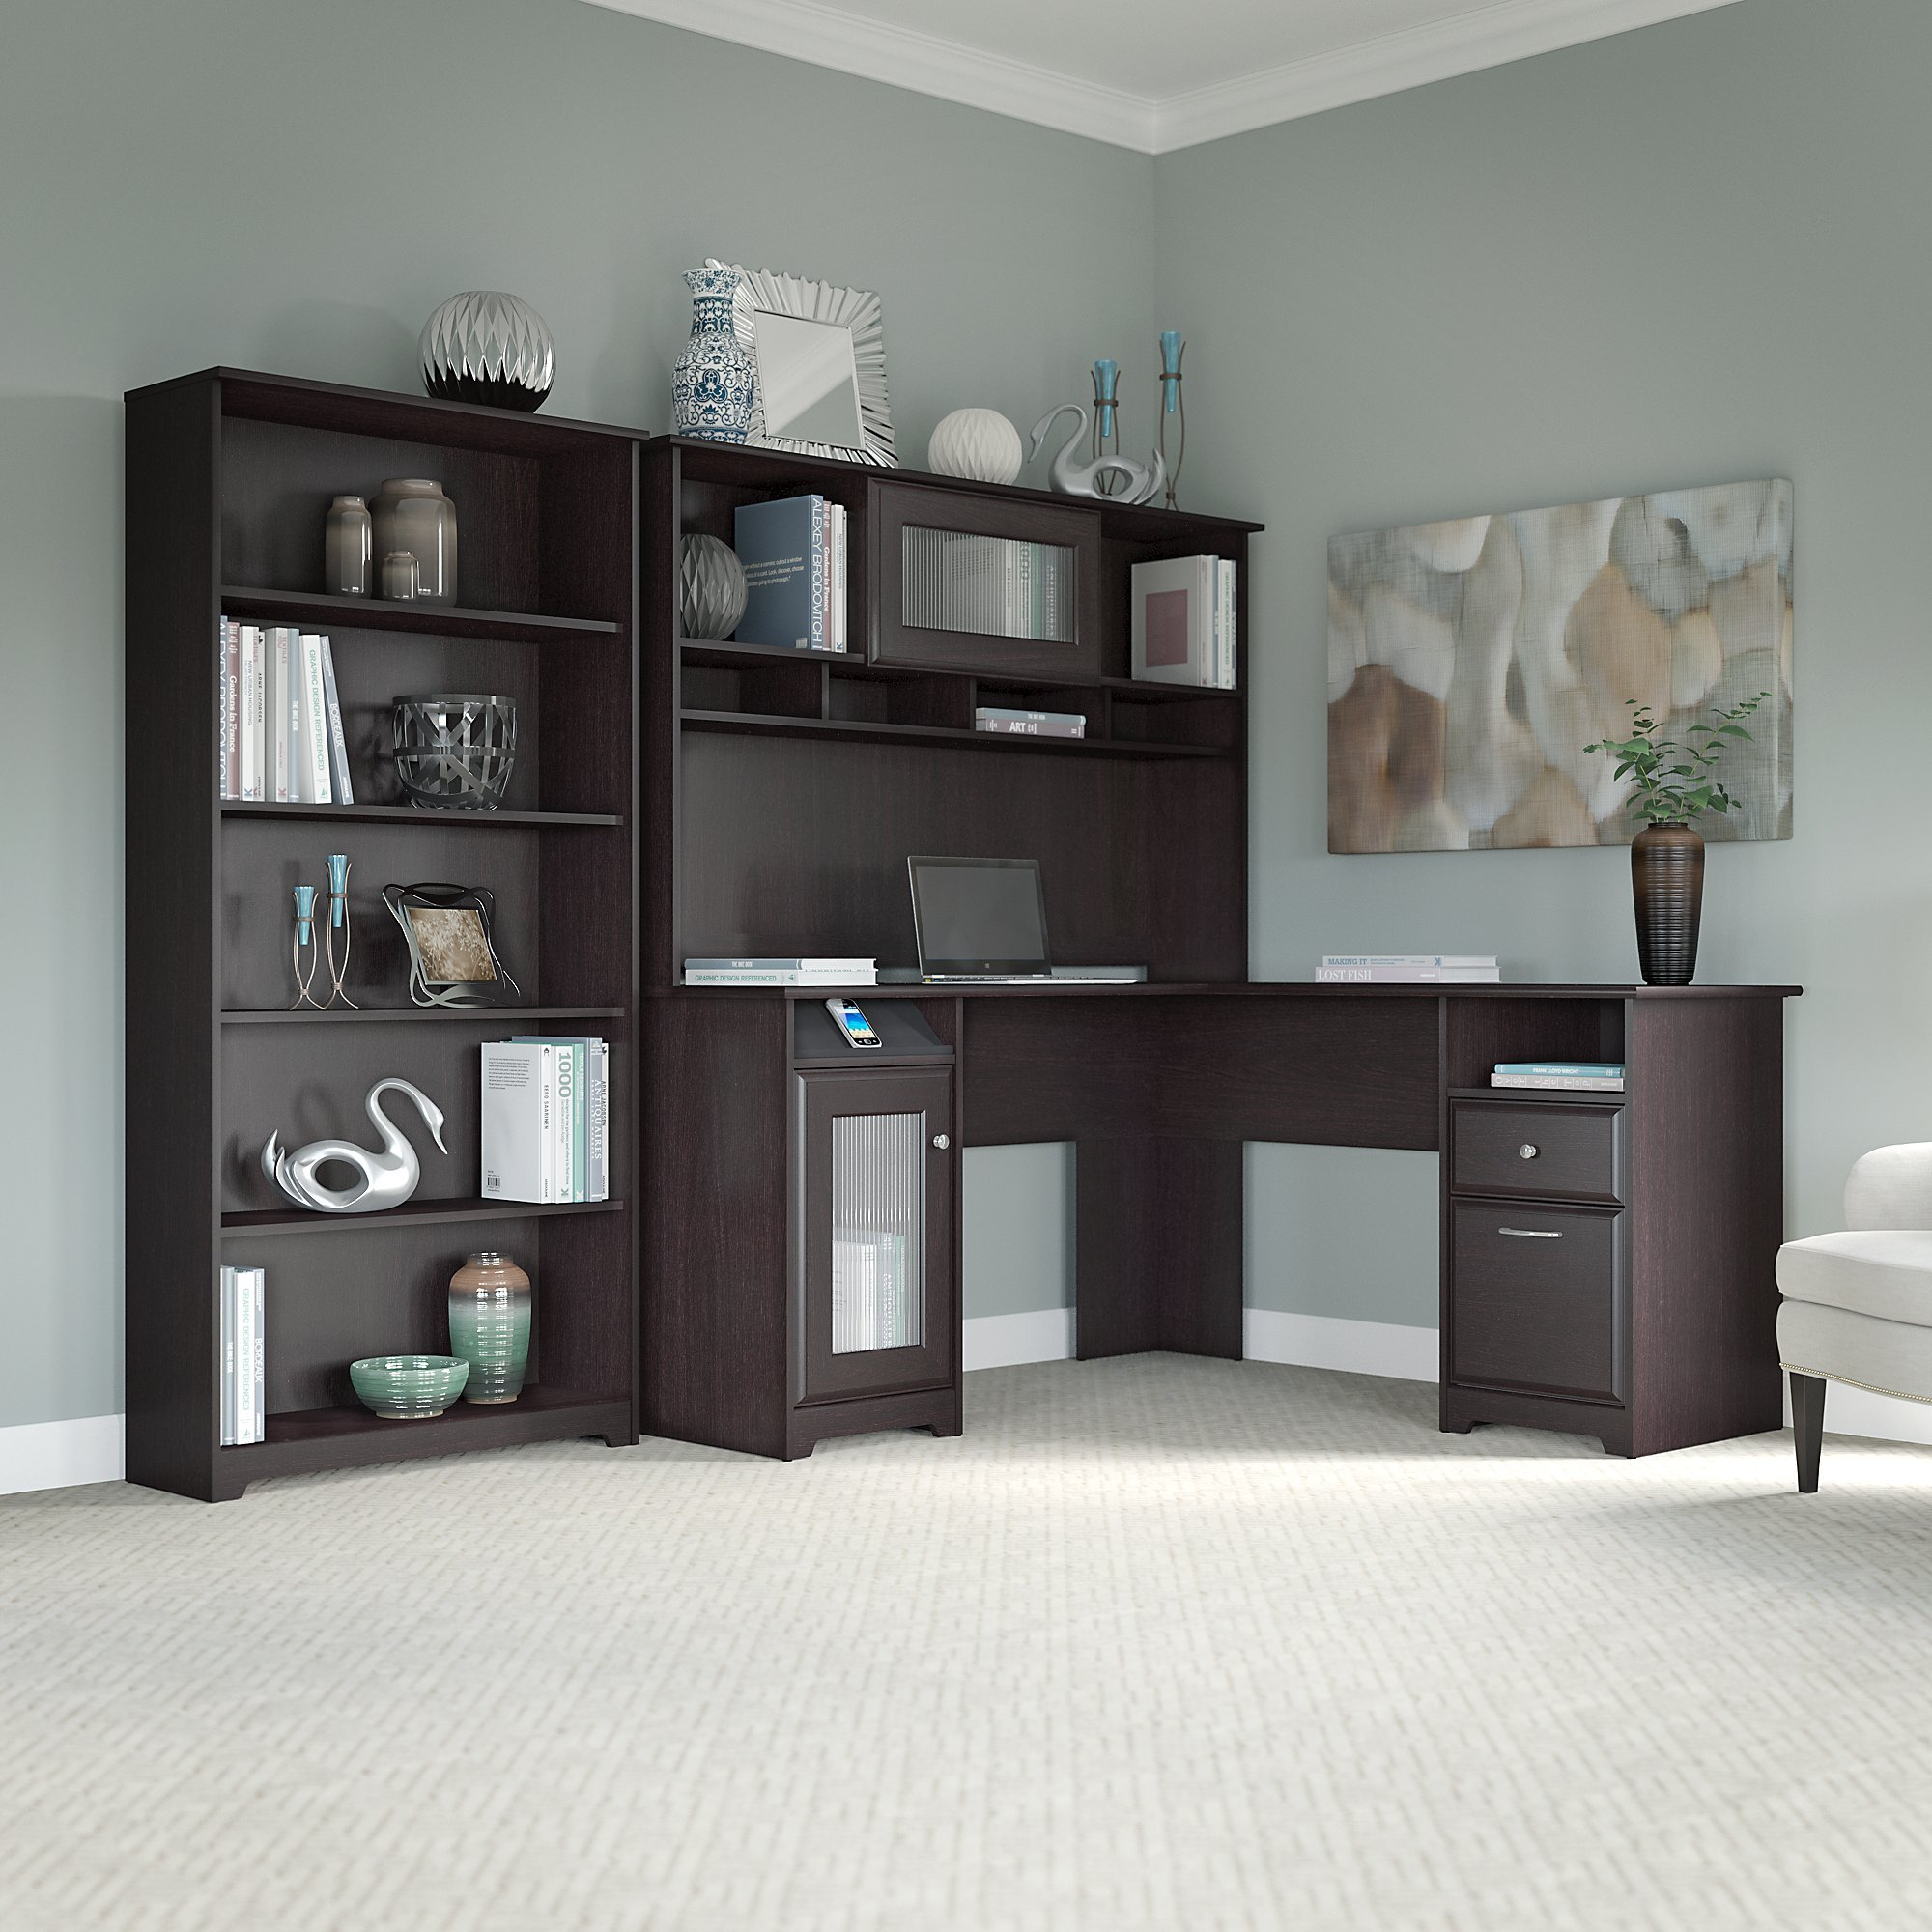 Cabot L Shaped Desk with Hutch and 5 Shelf Bookcase in Espresso Oak by Bush Furniture